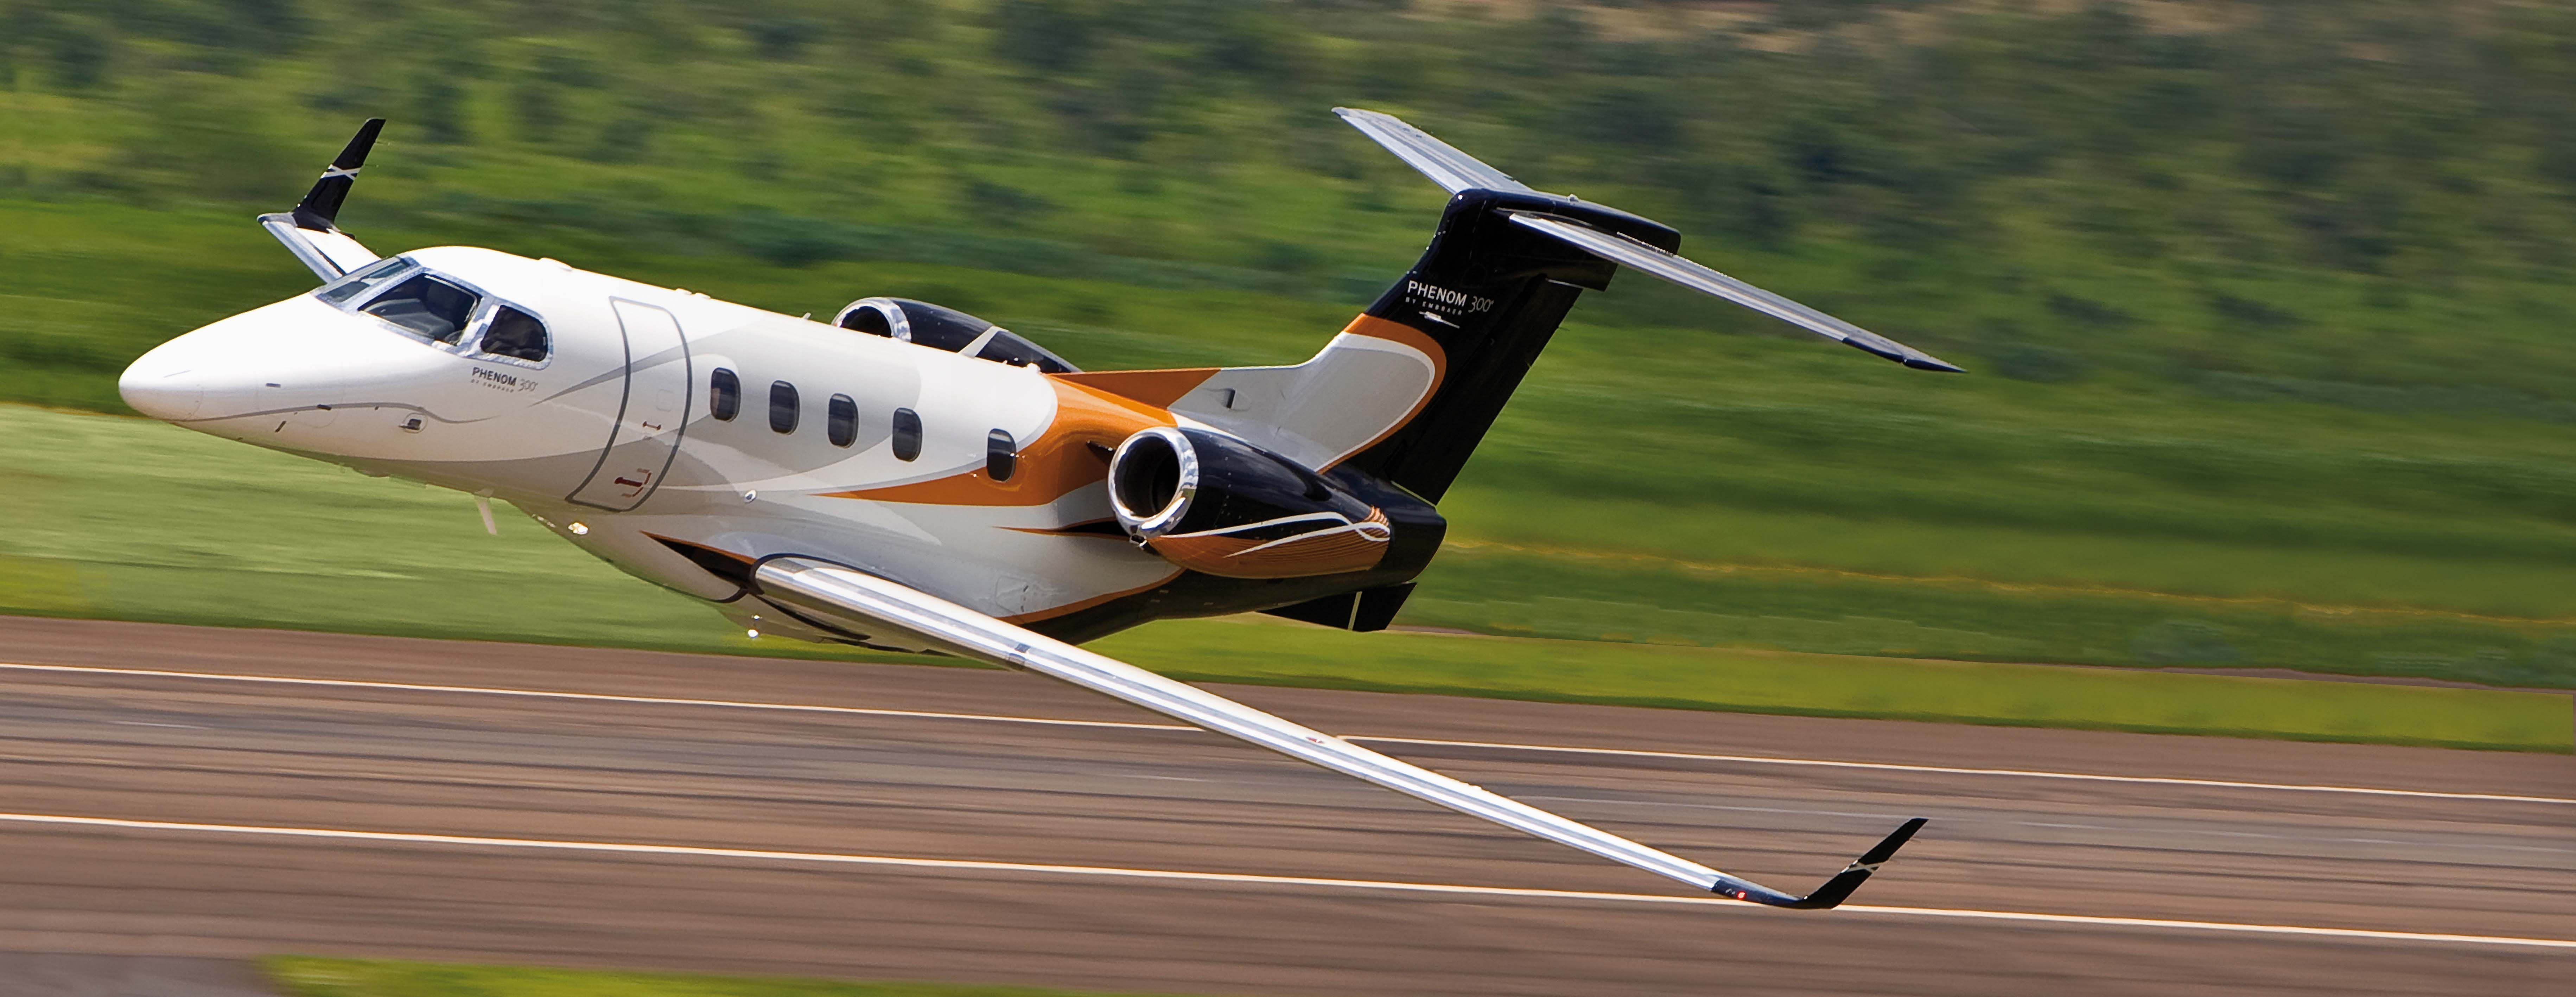 Phenom 300 cockpit phenom executive jet line leaders of innovation - Private Jets Embraer Phenom 300 For Sale Https Jetspectre Com Https